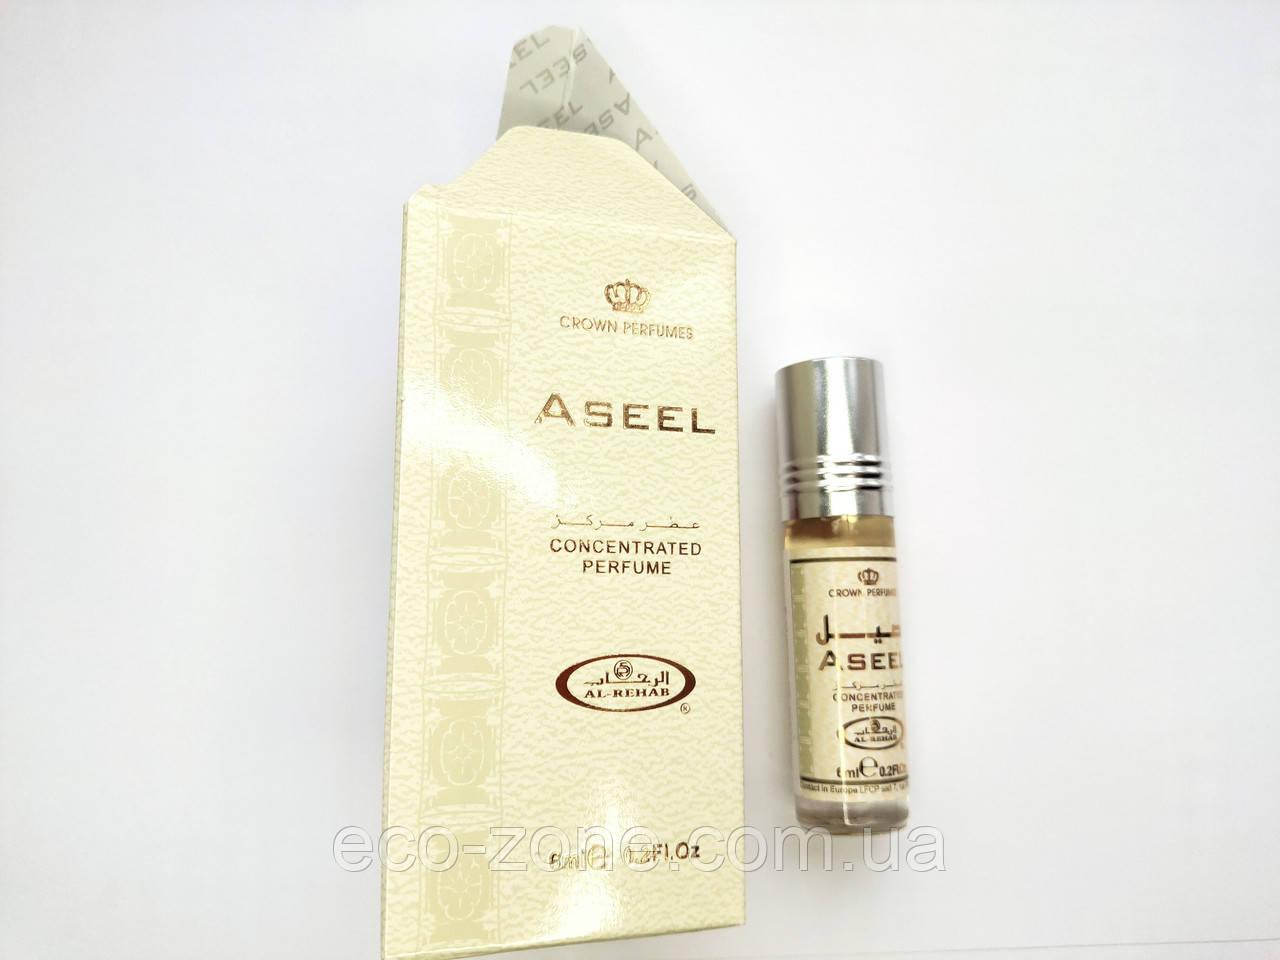 Арабские масляные духи  Аль-Рехаб - Aseel. Масло - 6 мл.